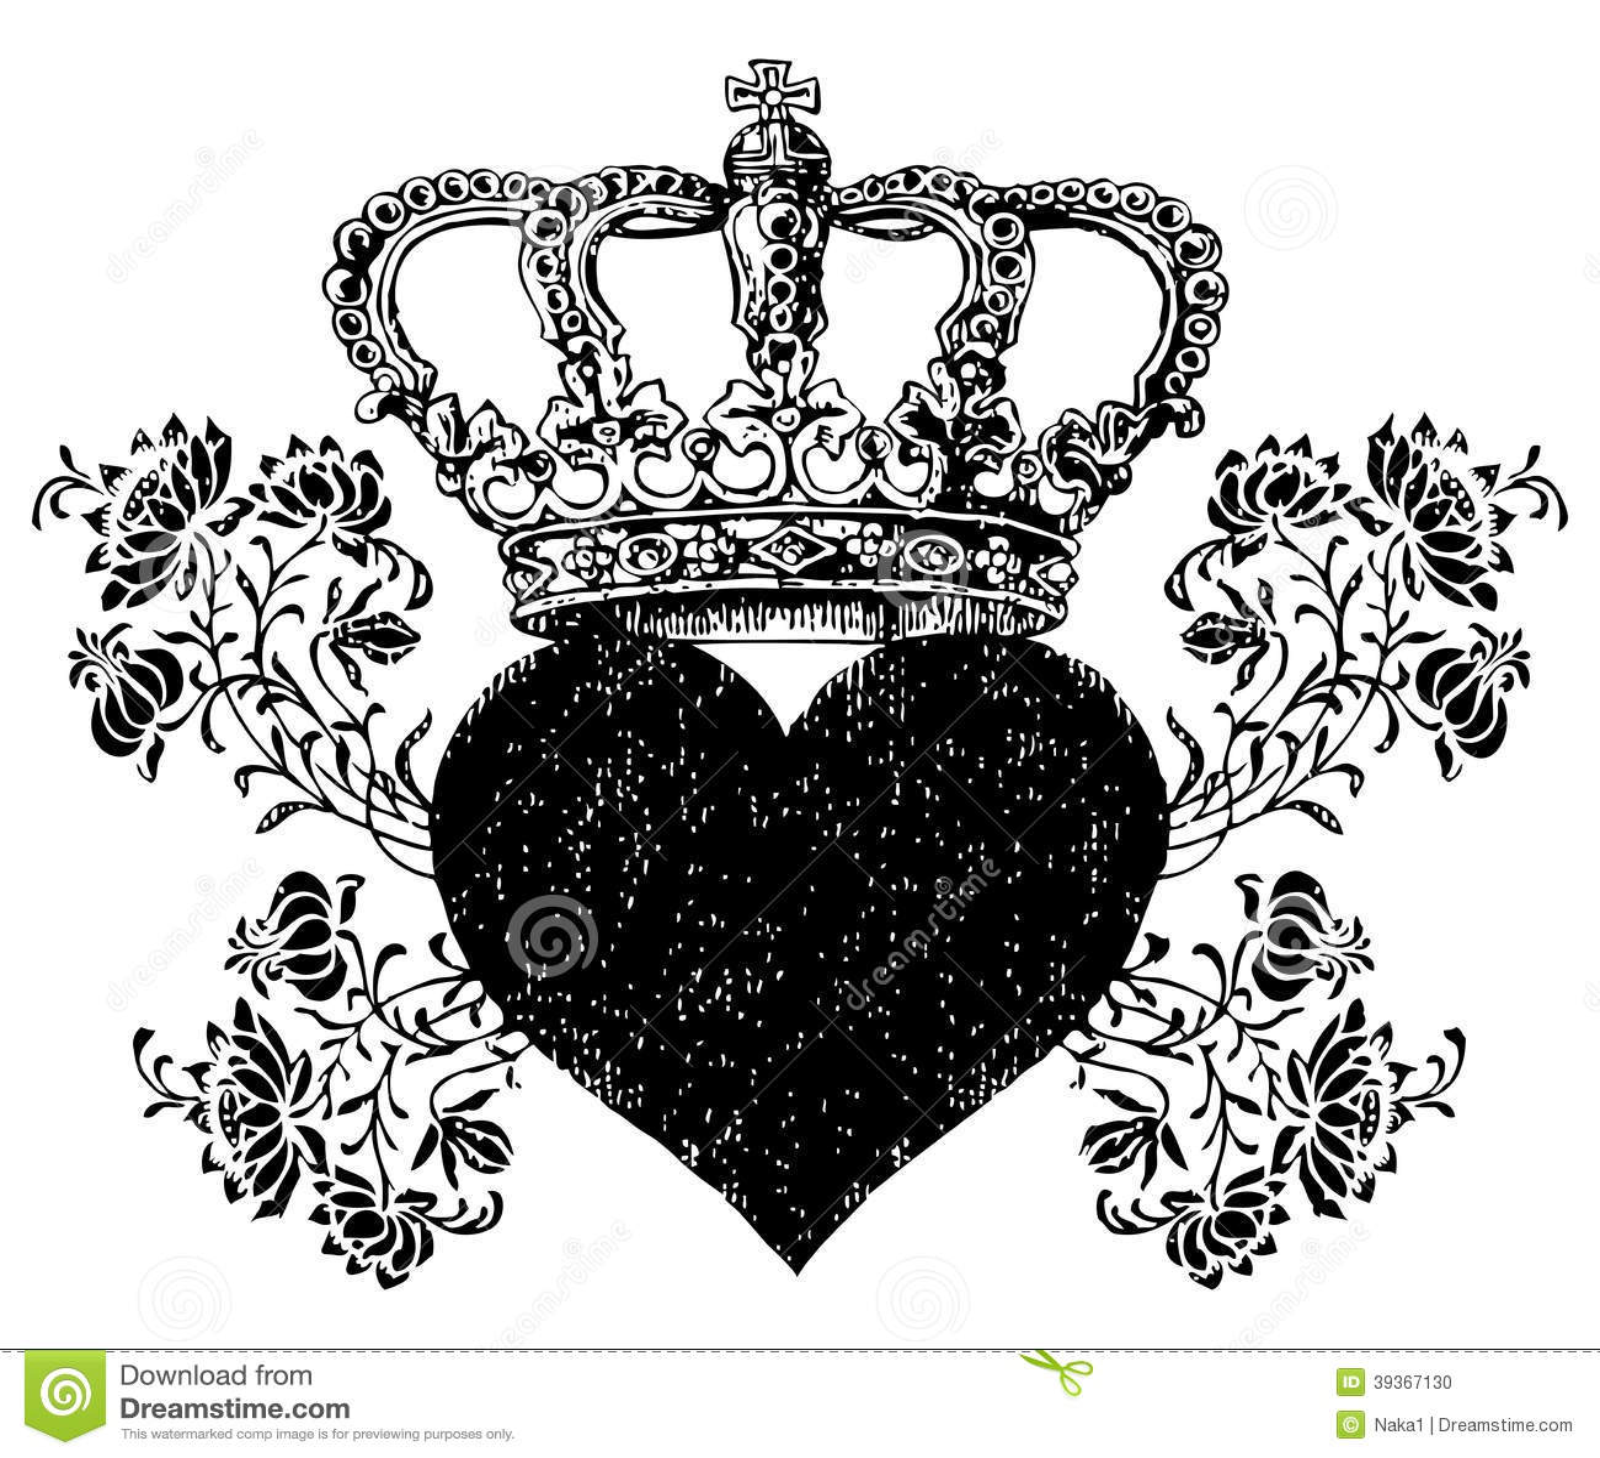 Roses Crucifix Design Crown Roses Heart Stock Illustration